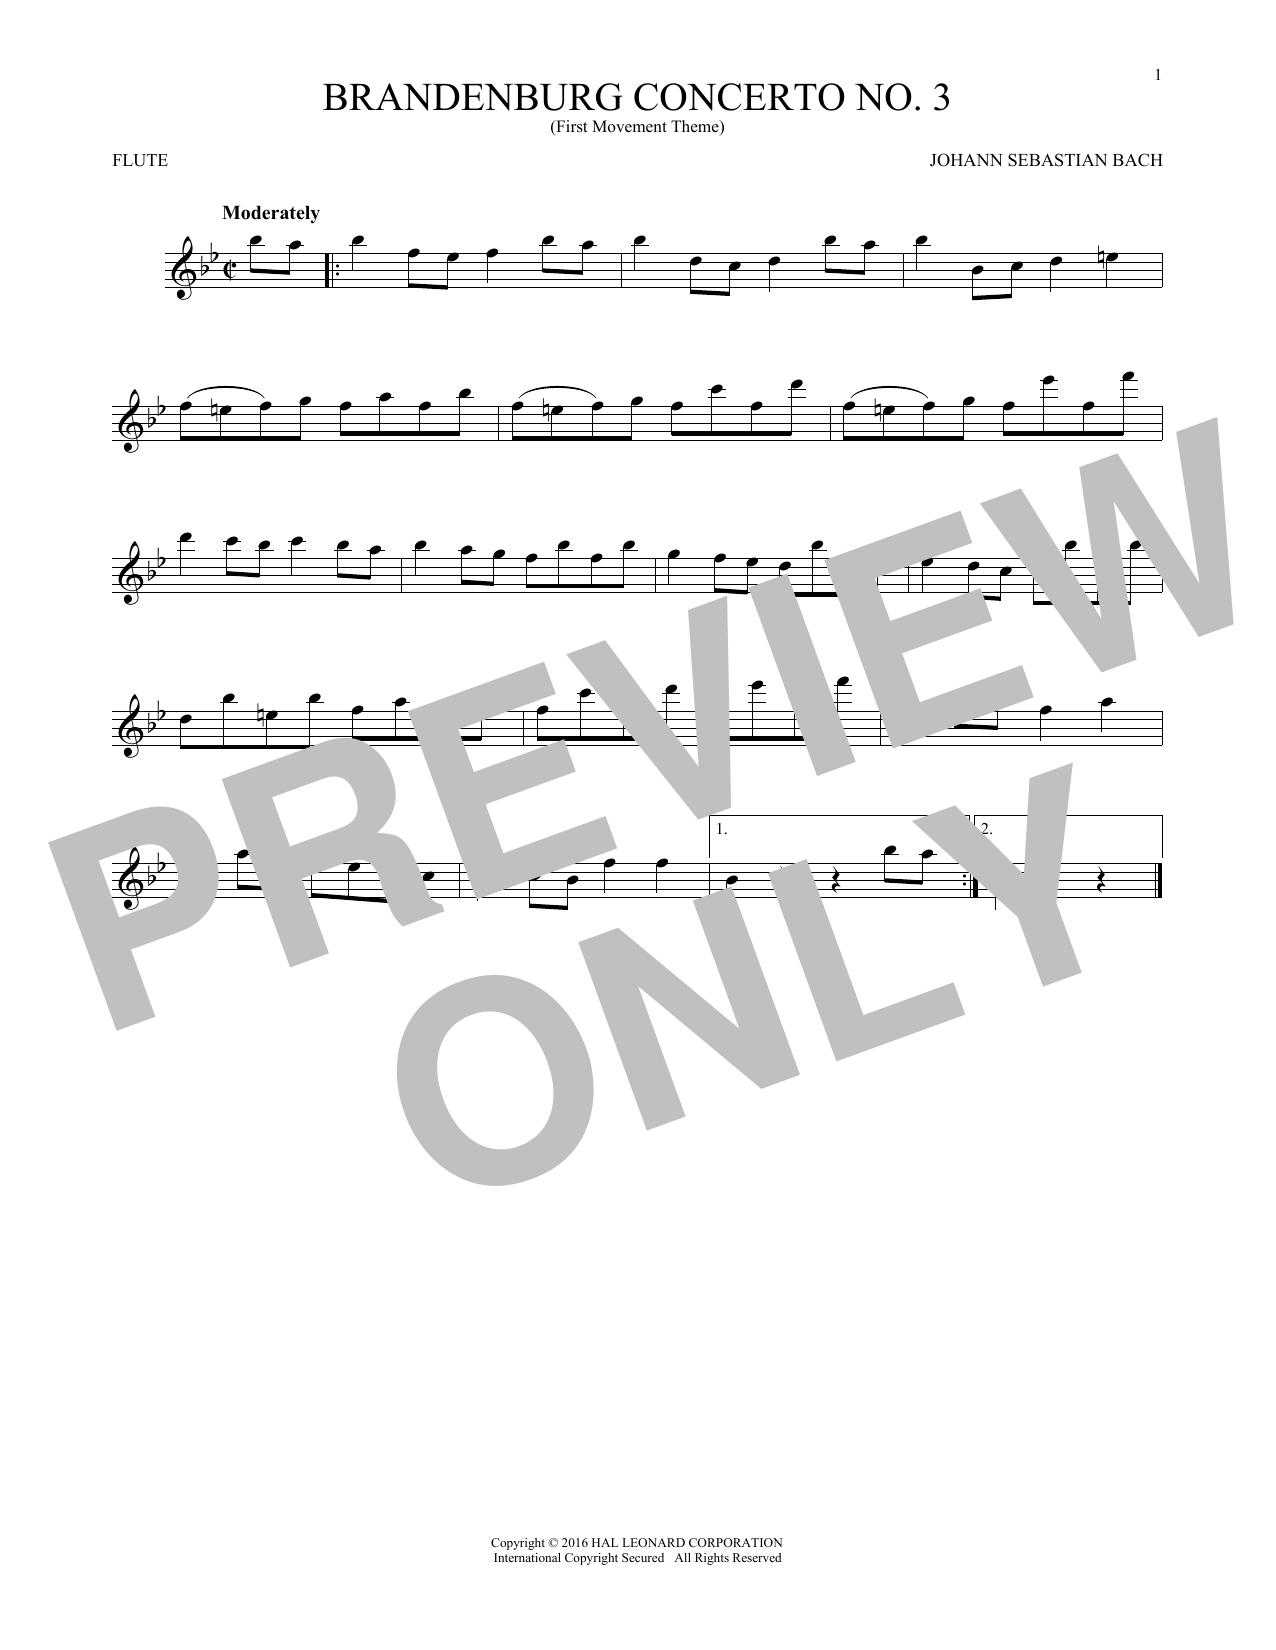 Brandenburg Concerto No. 3 (Flute Solo)